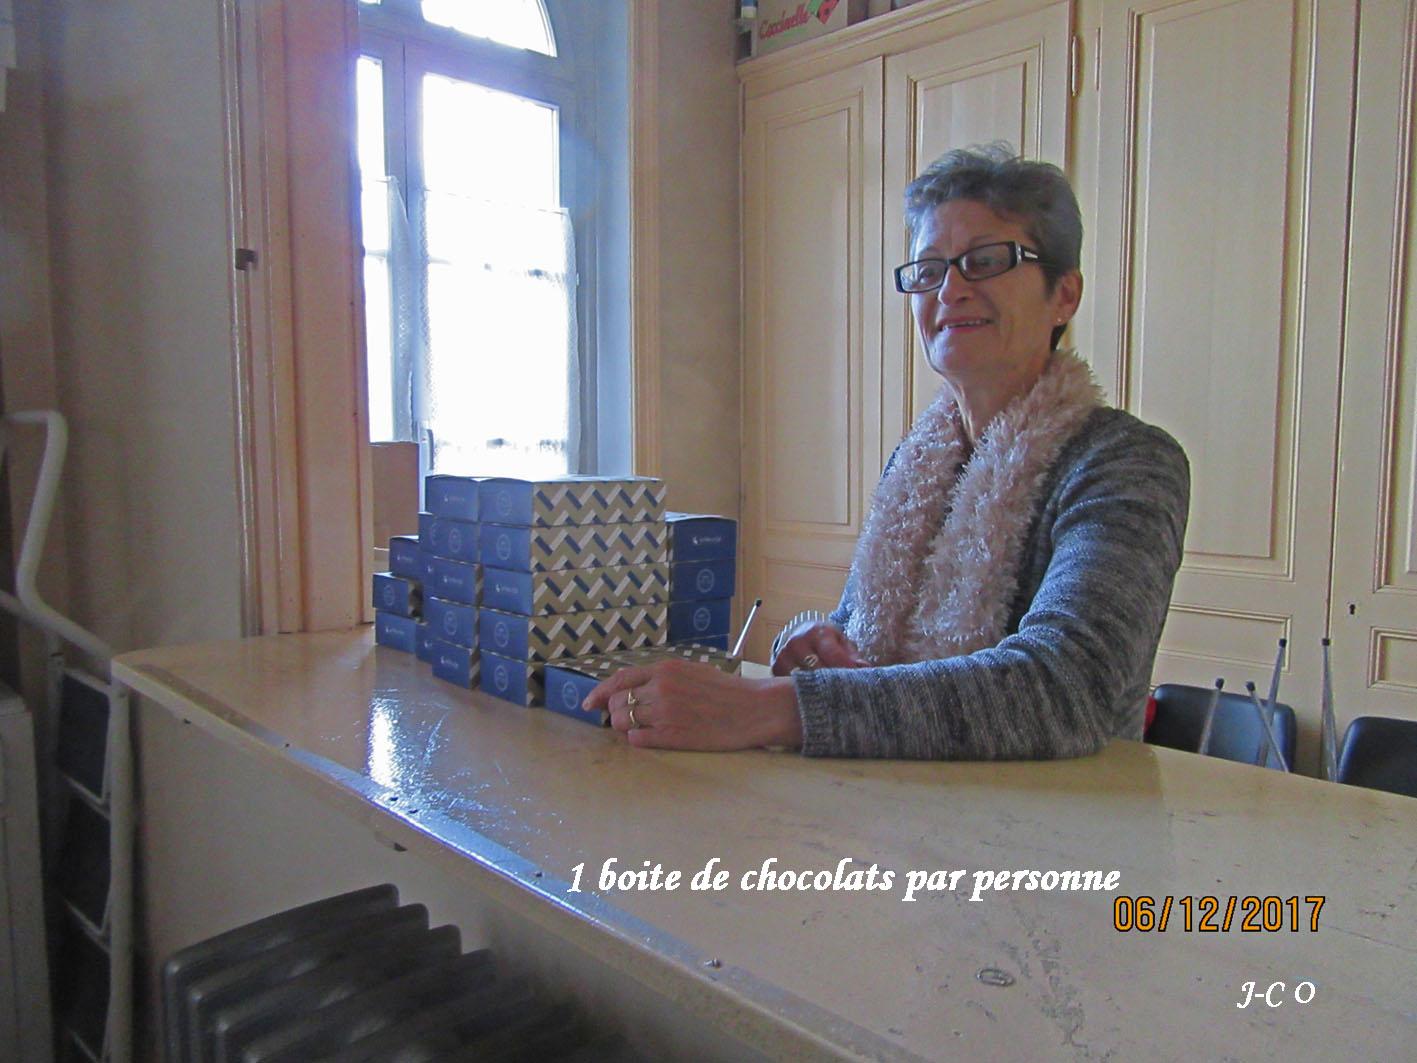 03 Distribution des chocolats